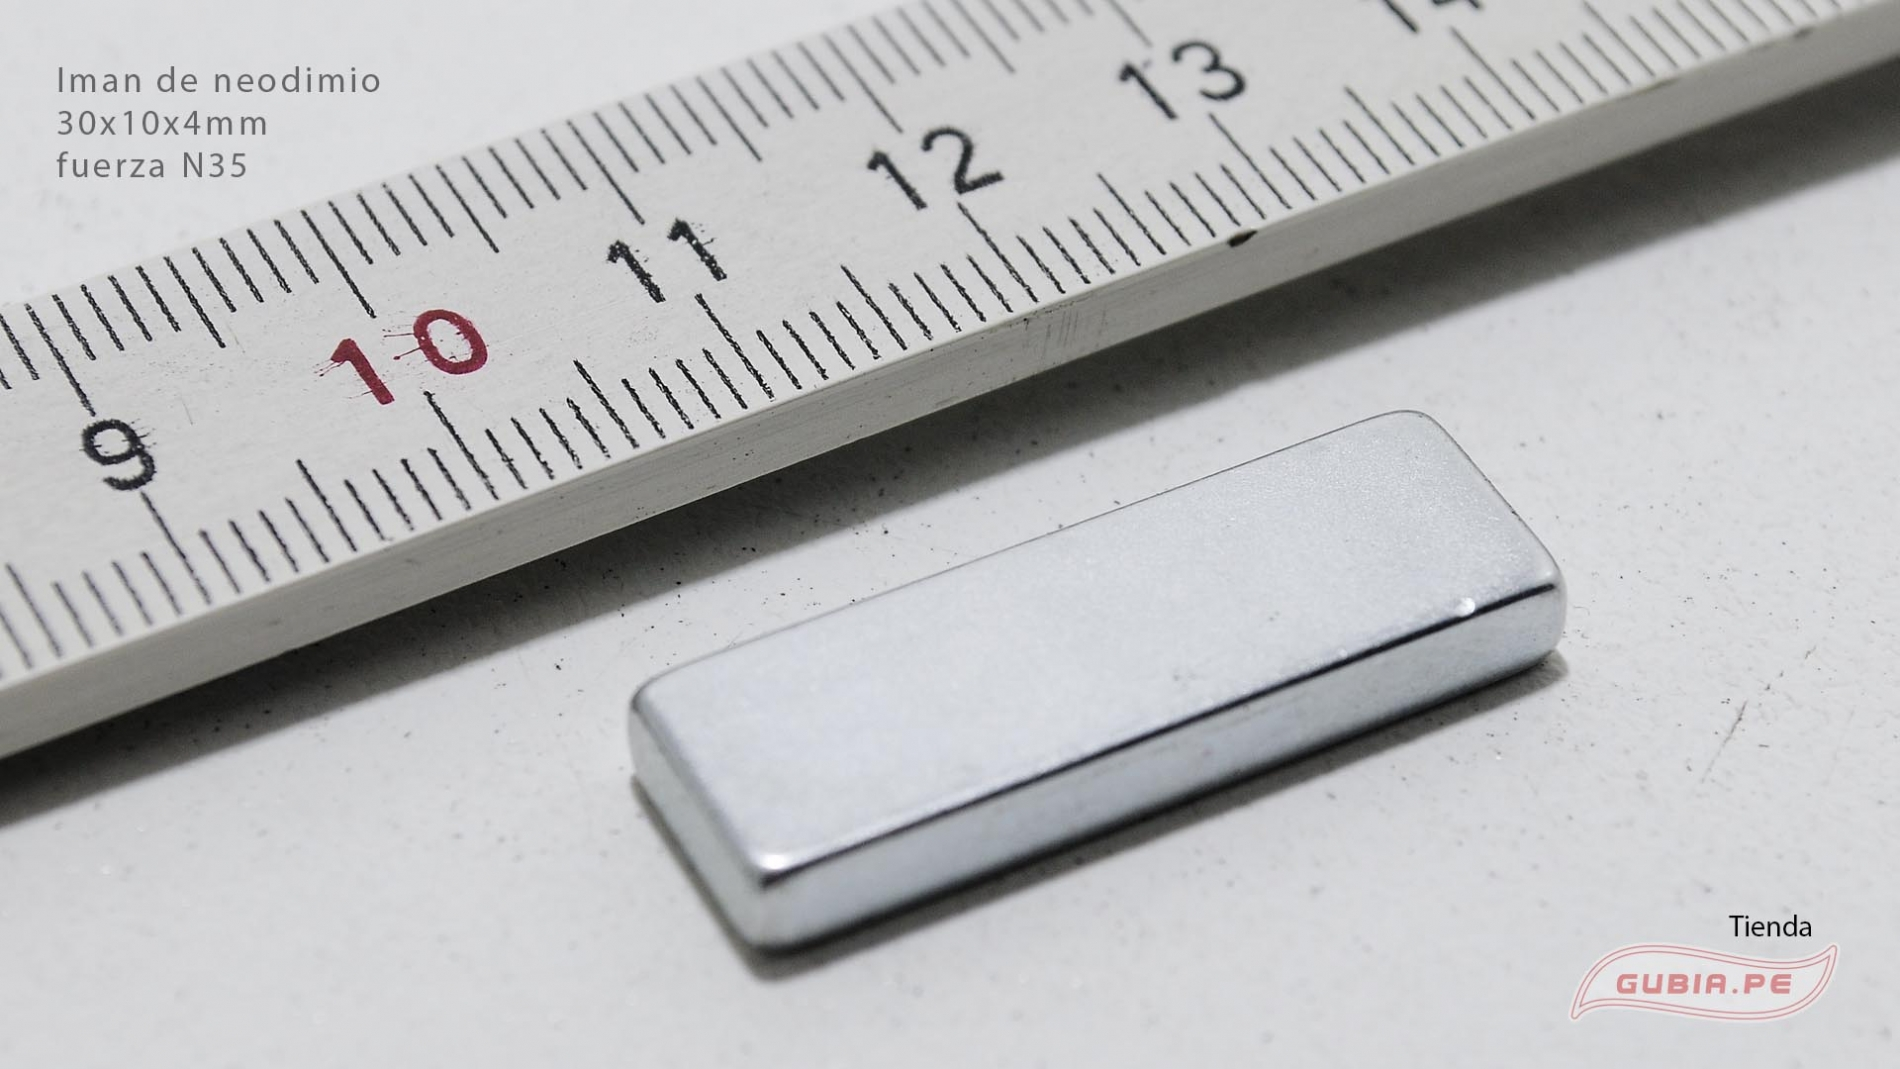 GUB0079-Iman de neodimio 30x10x4mm fuerza N35 GUB0079-max-1.